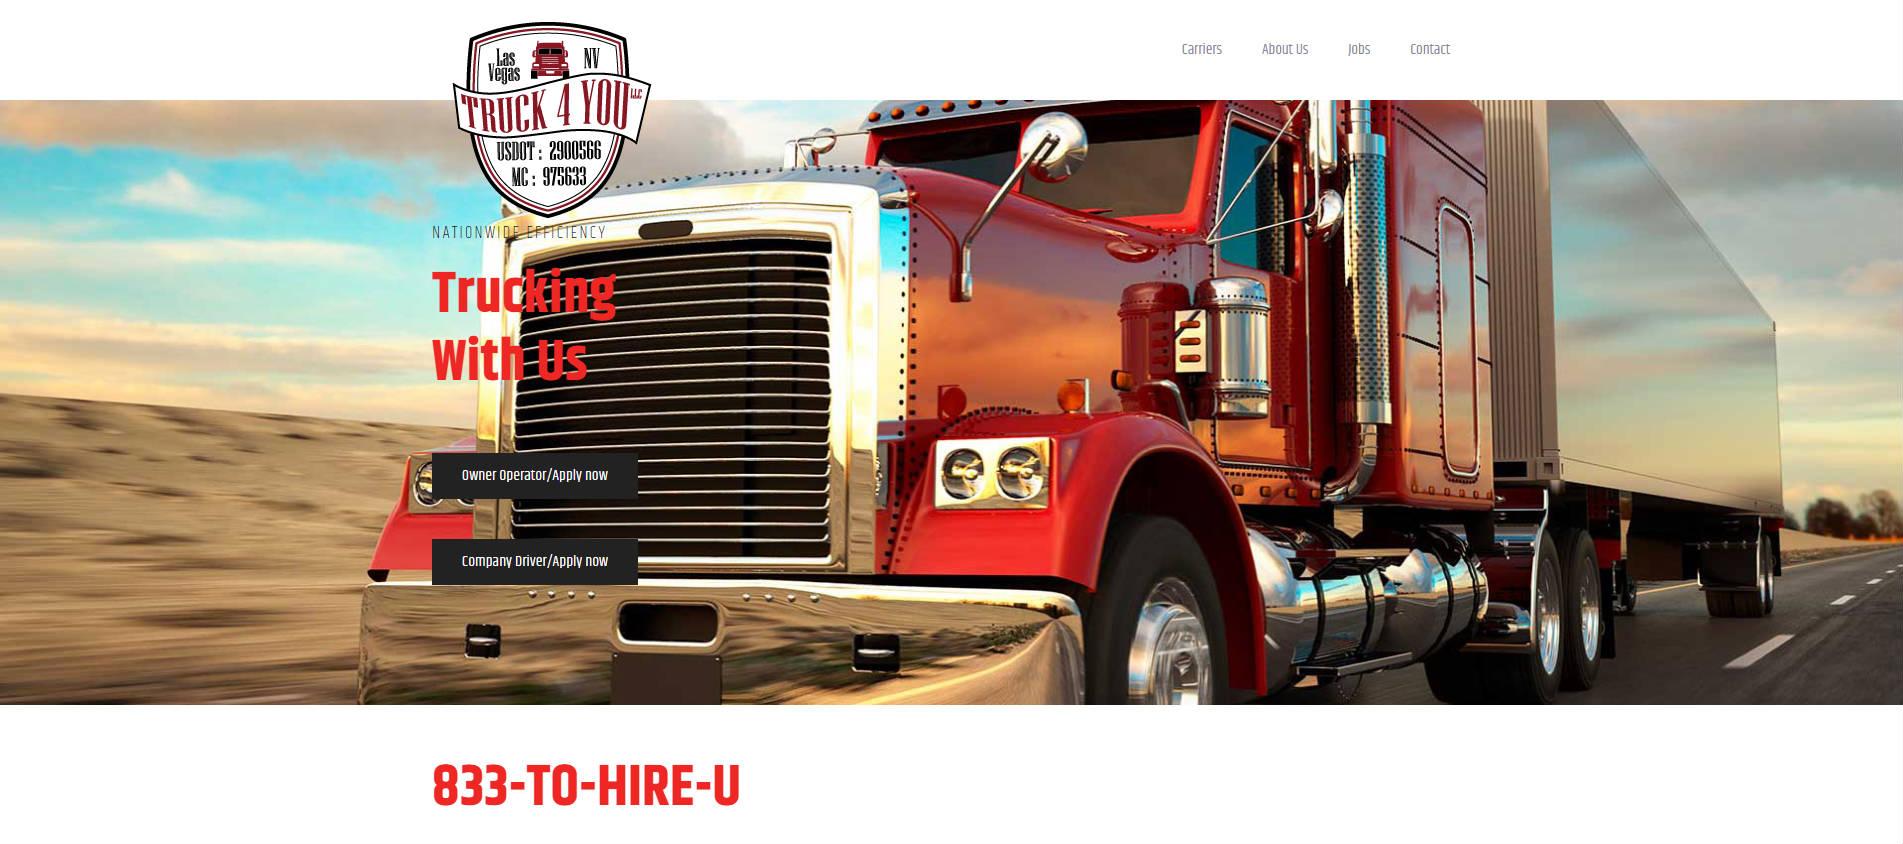 truck4you ewbsite web rešenja lobohouse